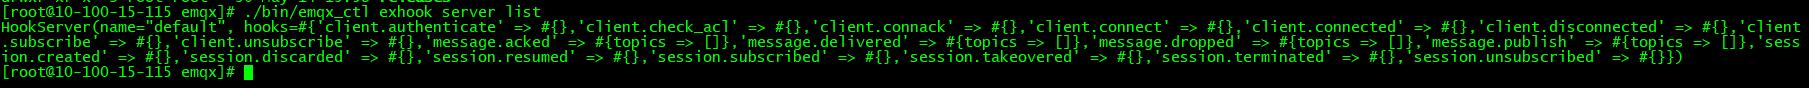 emqx_ctl exhook server list输出